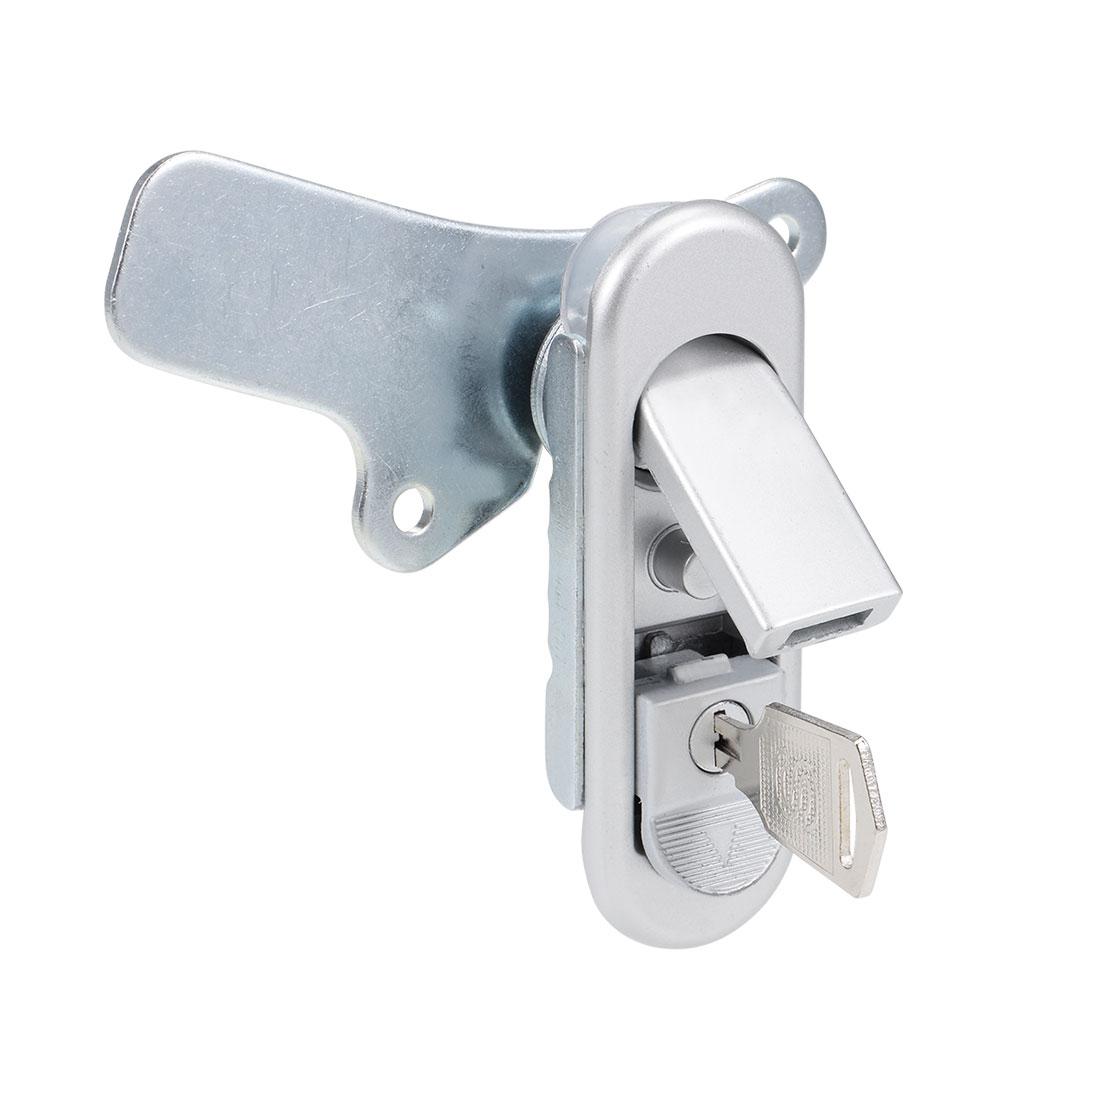 Electric Cabinet Panel Cam Lock Push Button Pop Up Type Door Lock w Key